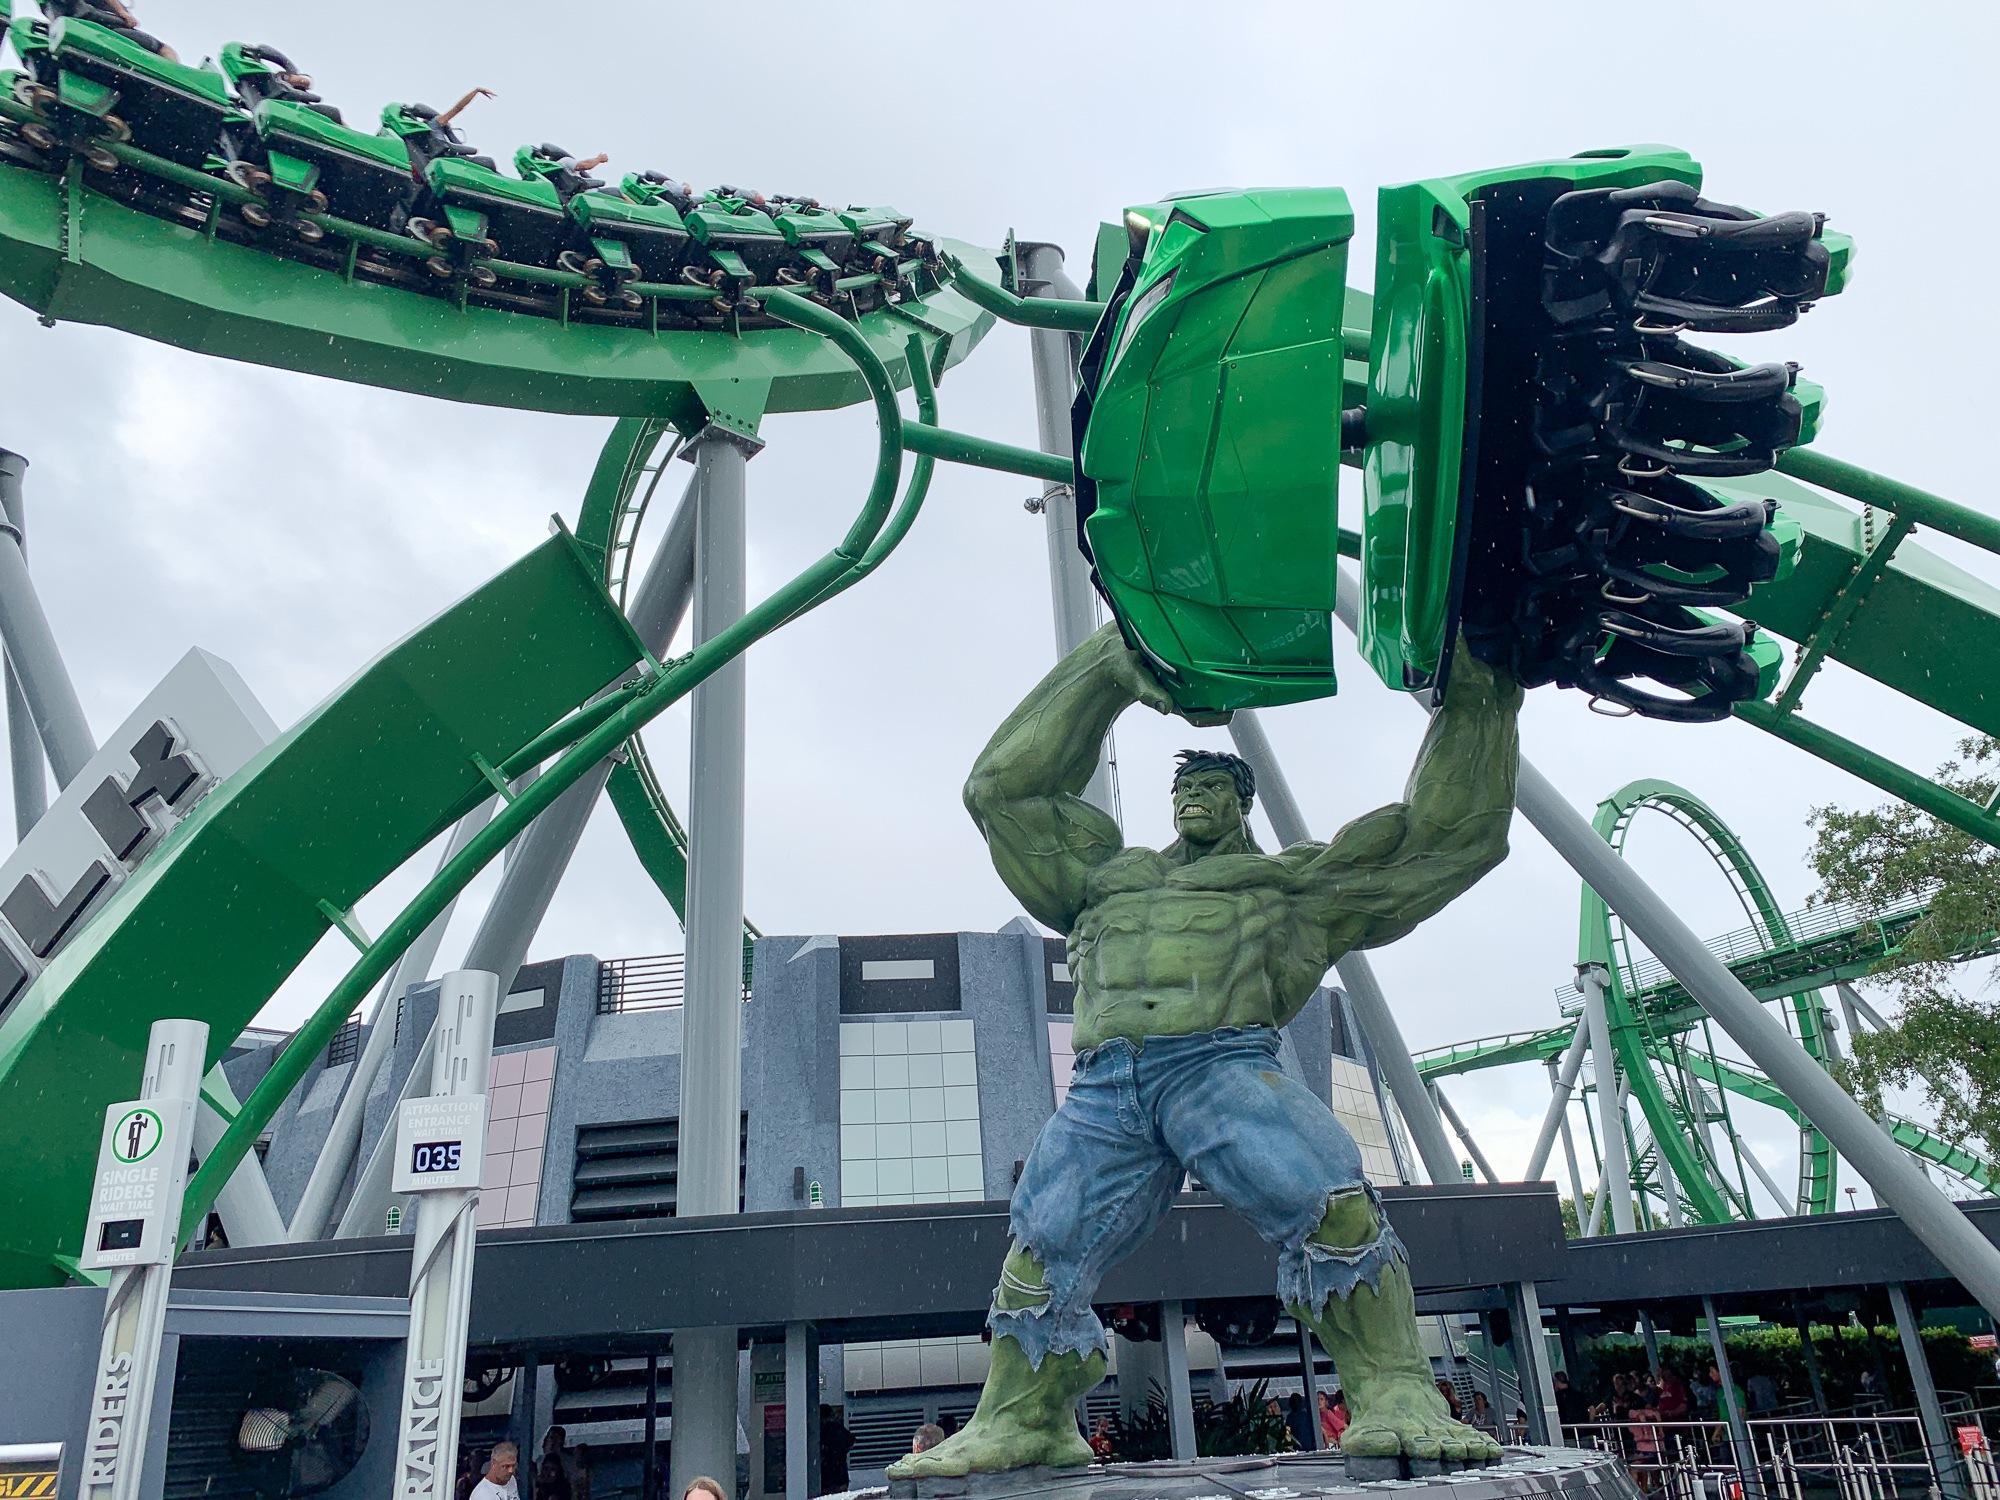 The Incredible Hulk Coaster at Islands of Adventure